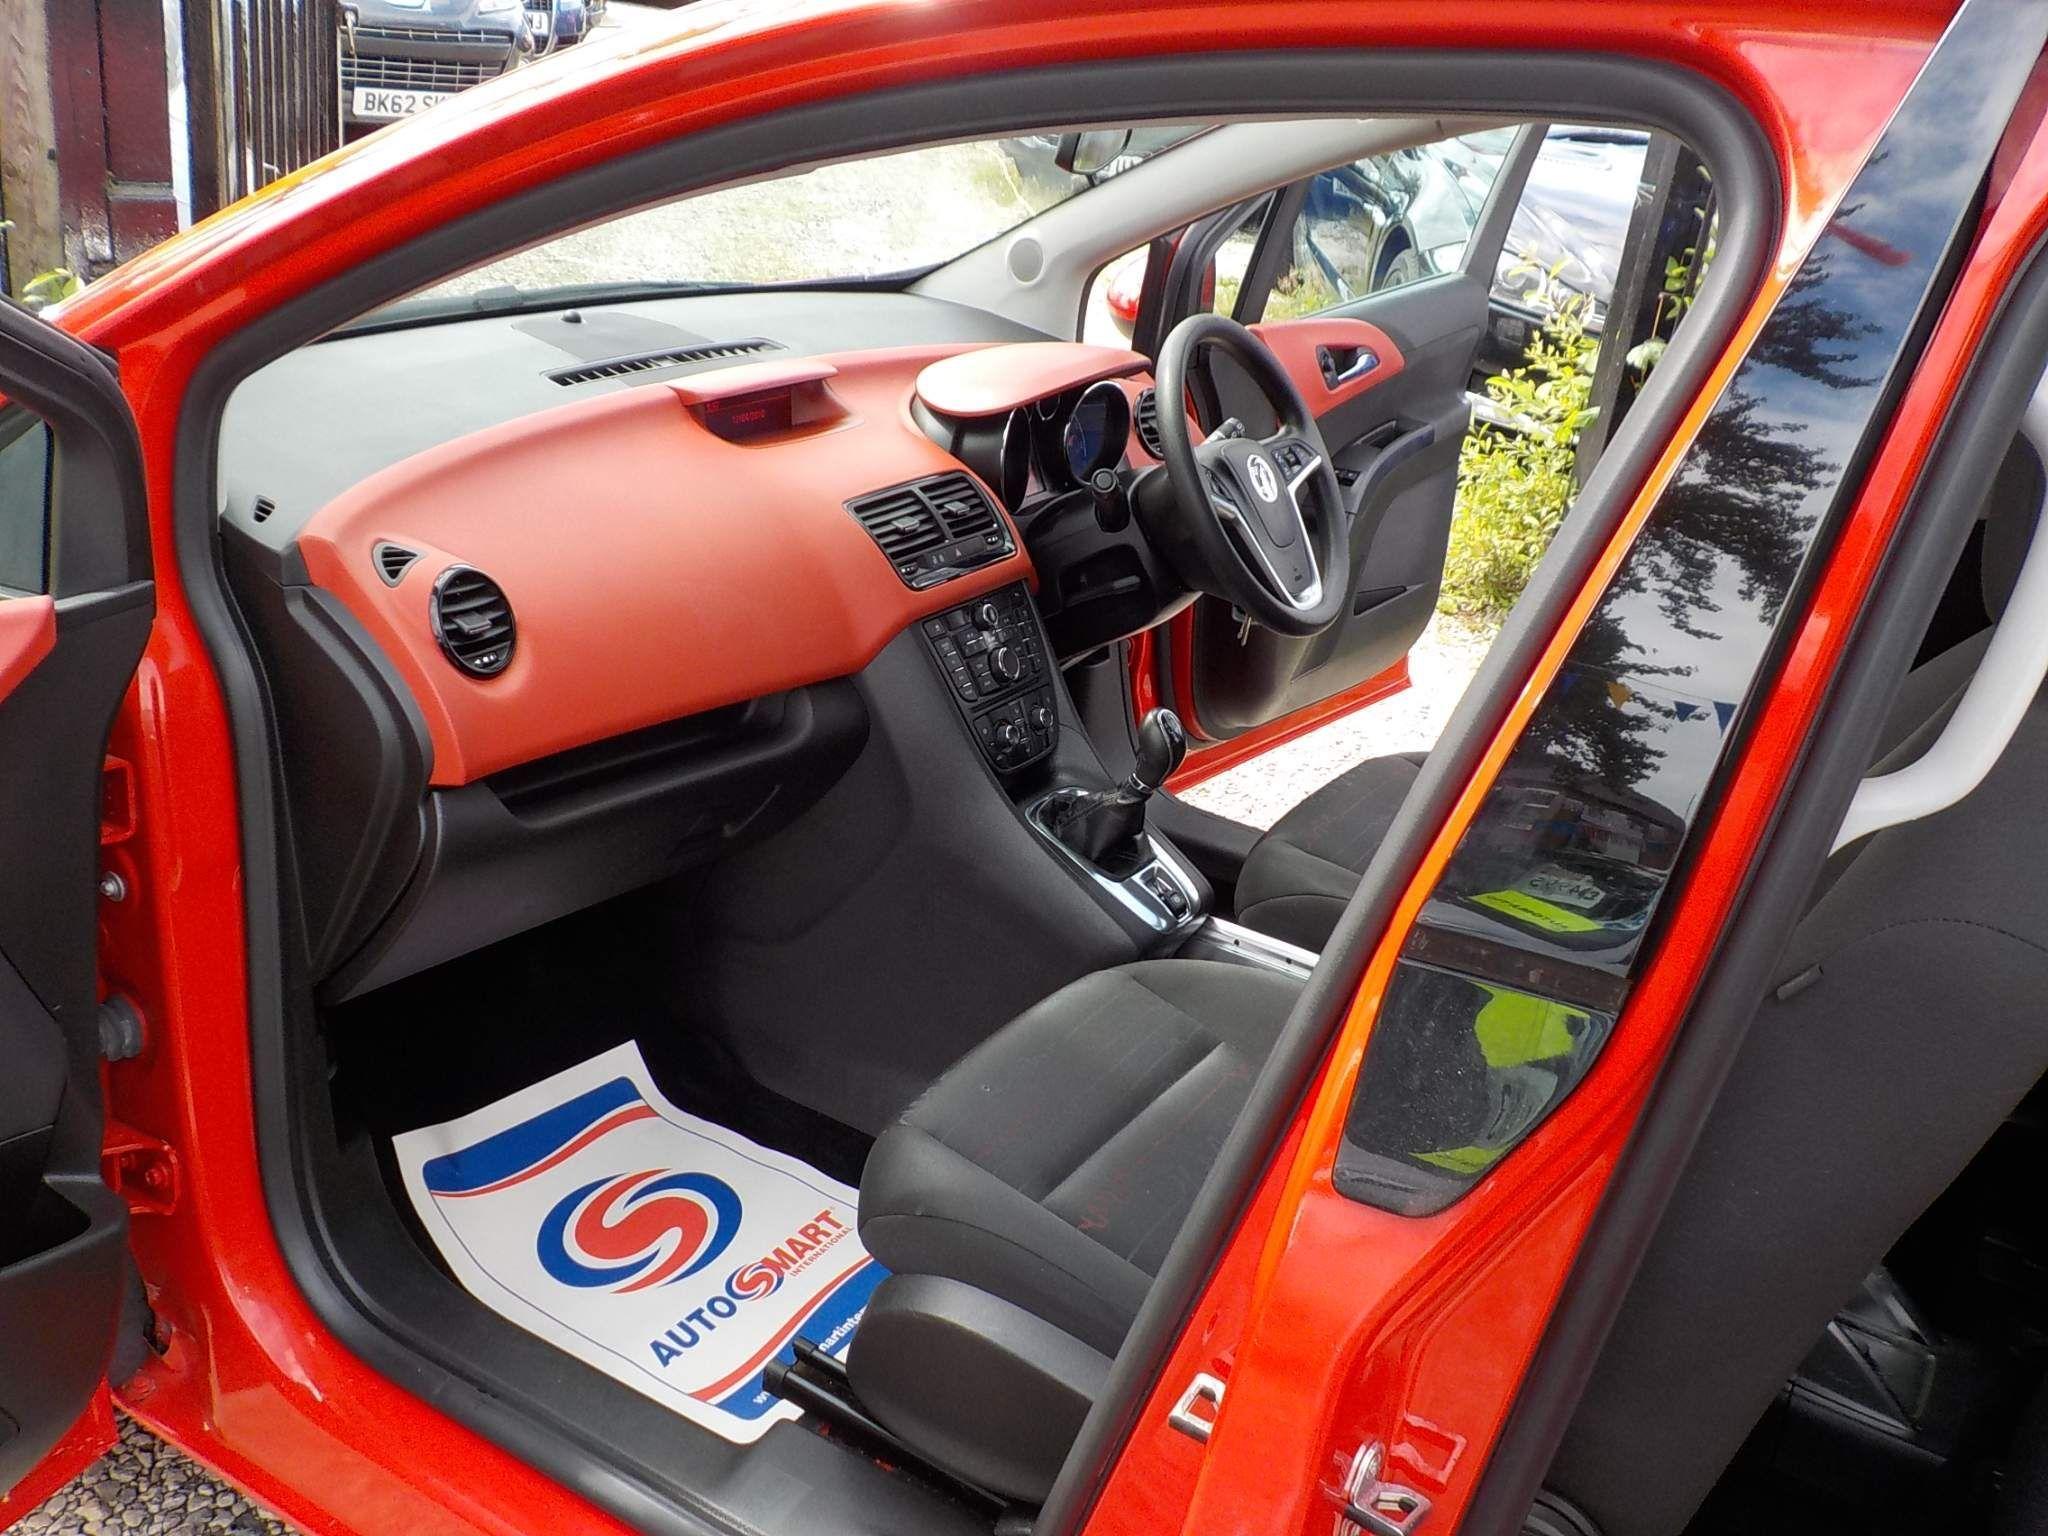 Vauxhall Meriva 1.4 i 16v Exclusiv 5dr (a/c)